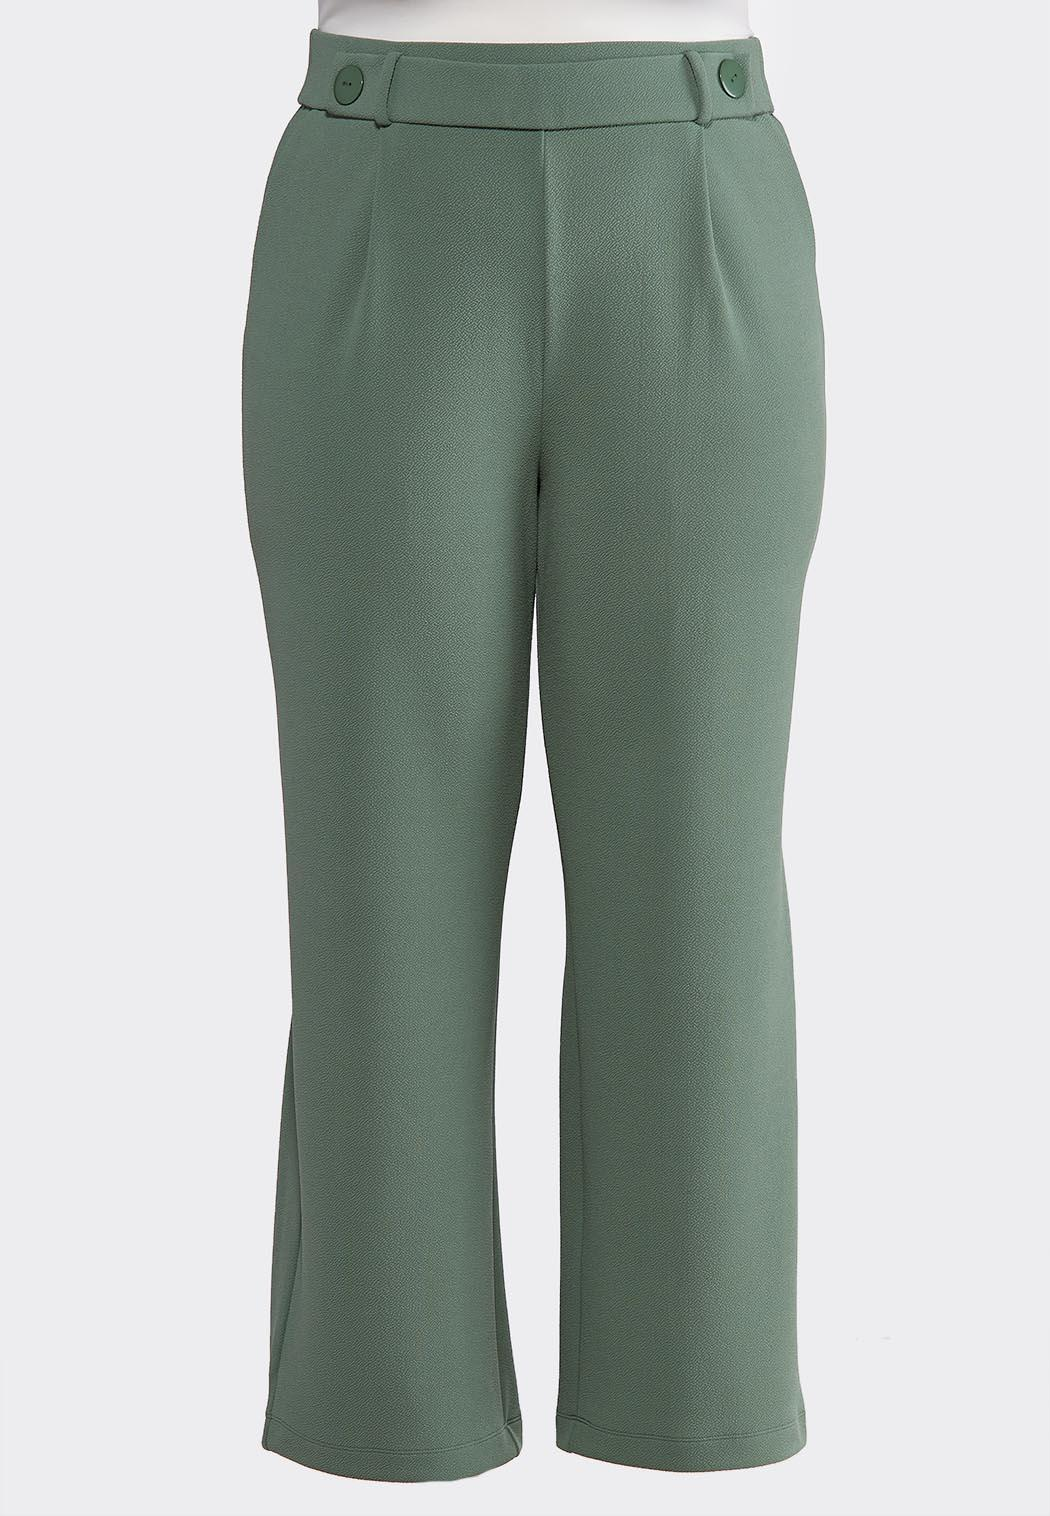 7e4fcc6e82b Plus Size Button Tab Pants Wide Leg Cato Fashions